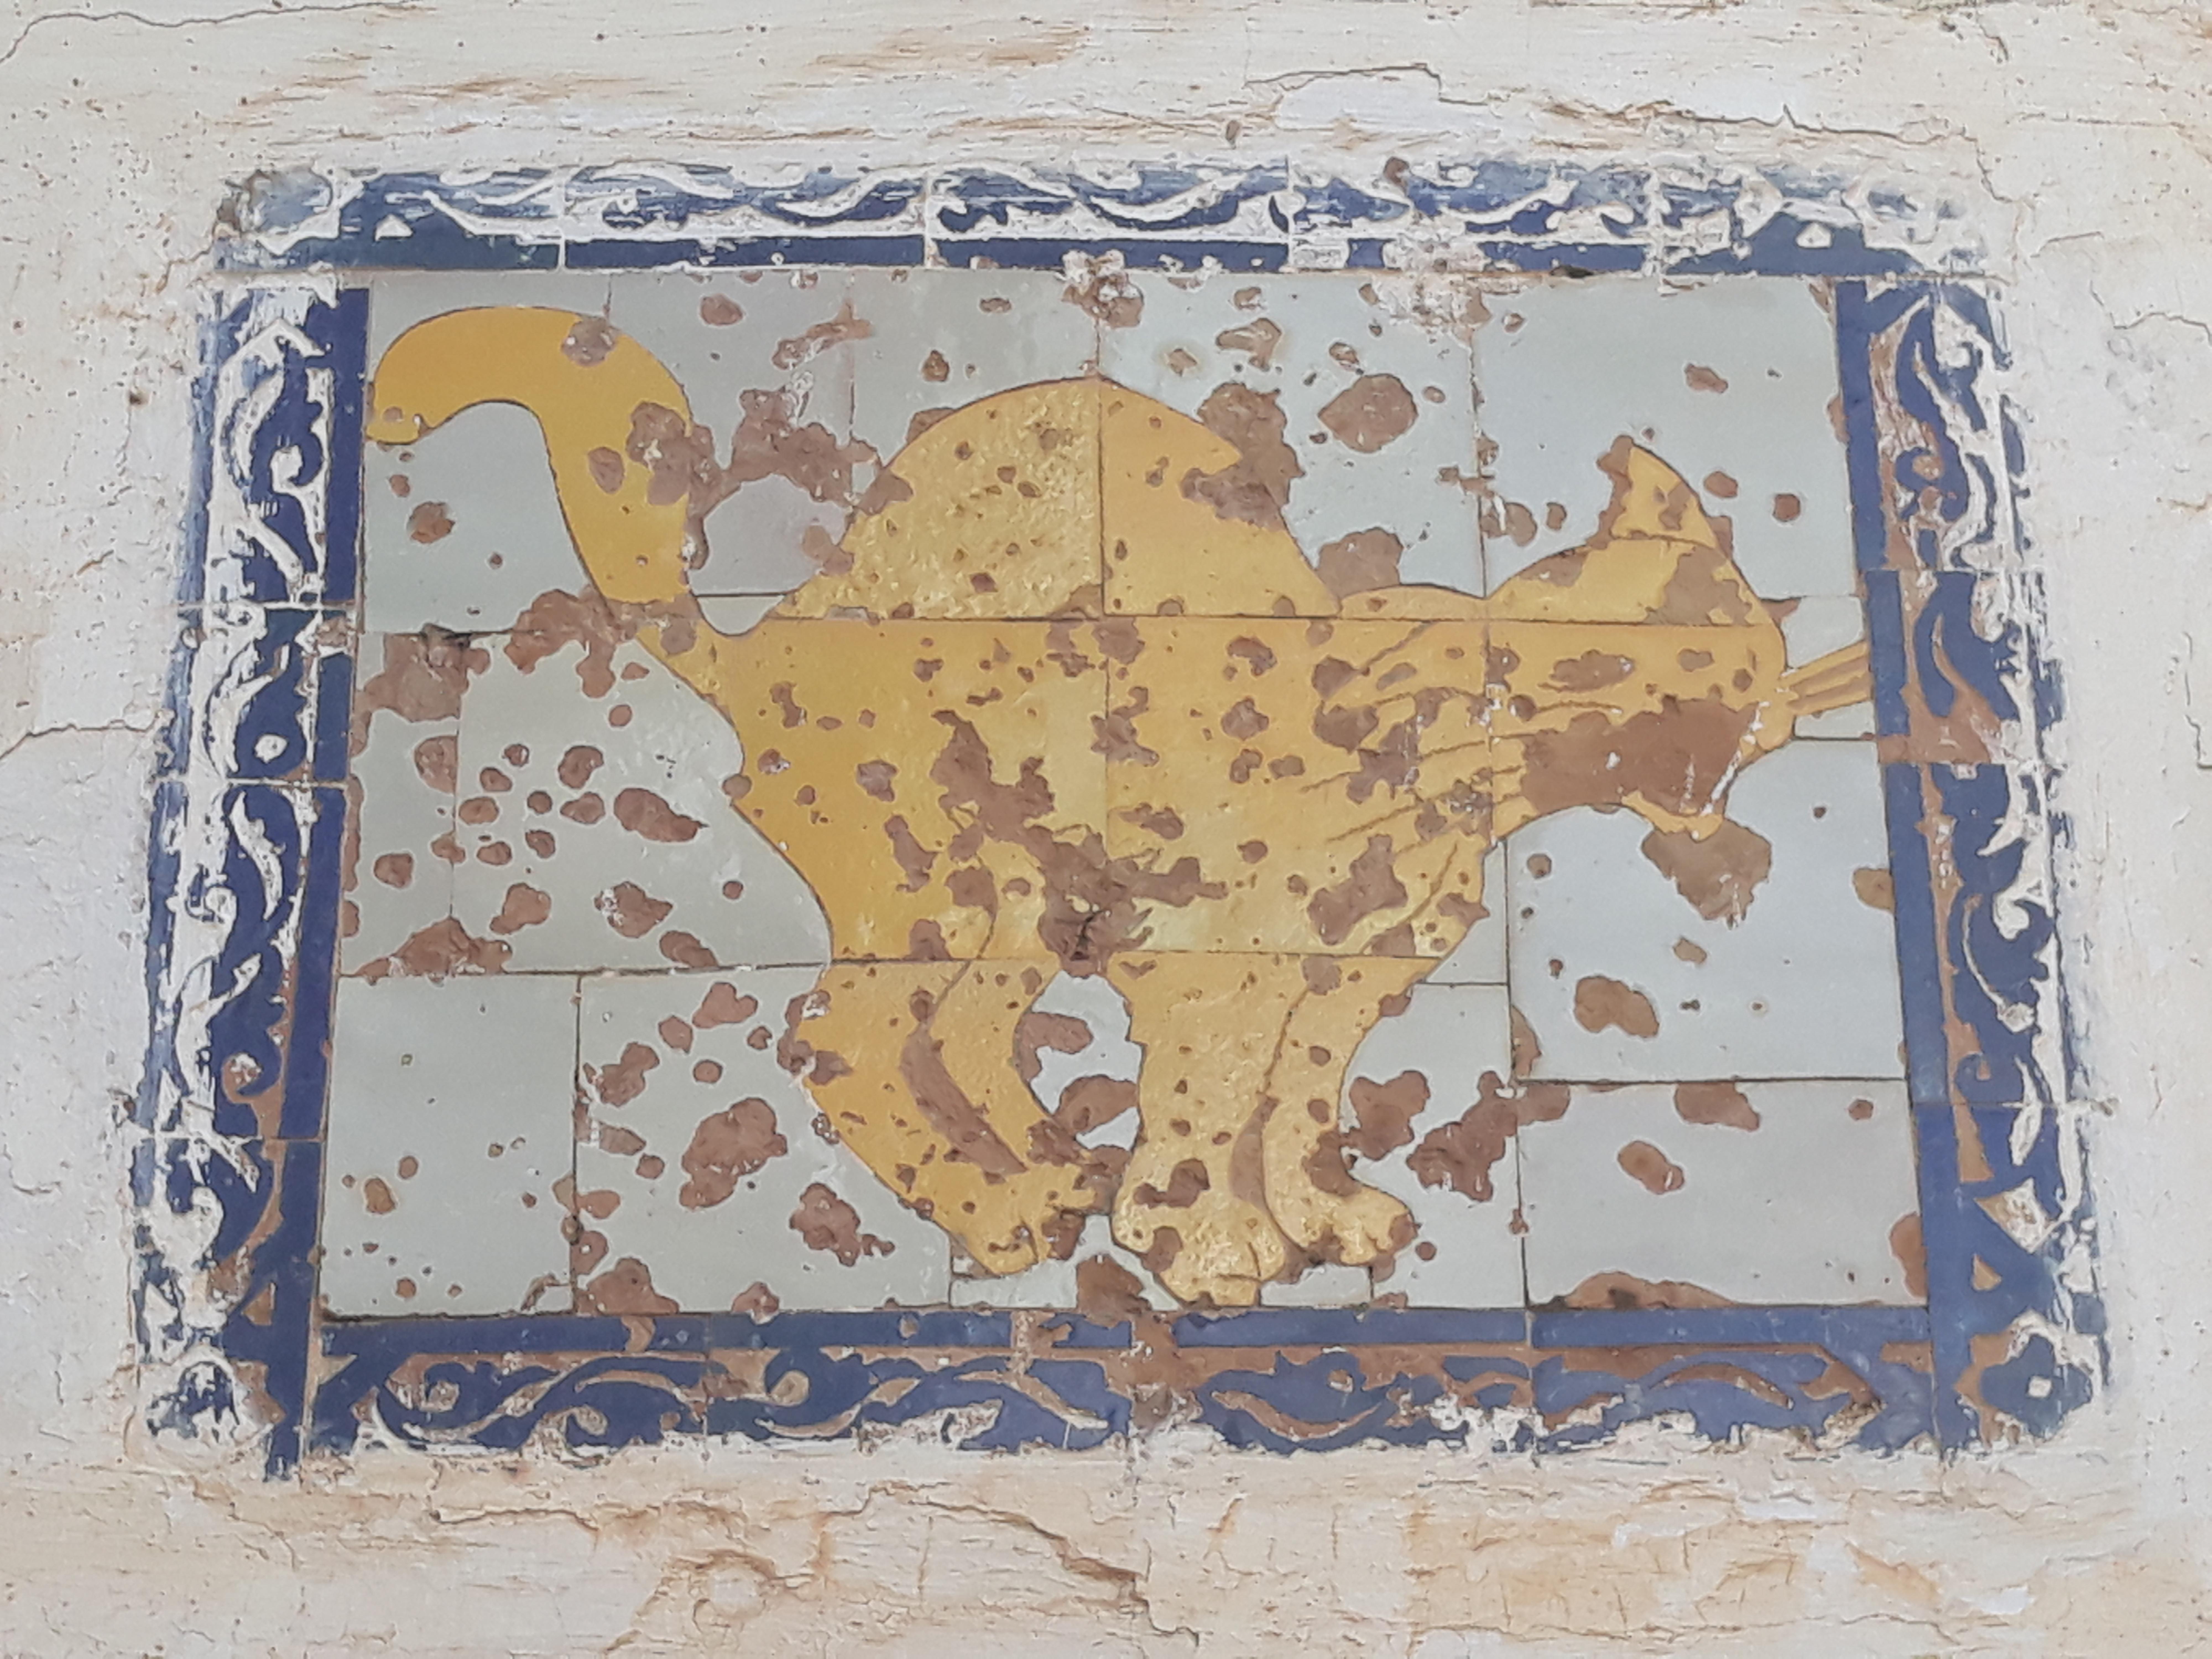 Mosaïque de la Kasba des Oudayas, Rabat